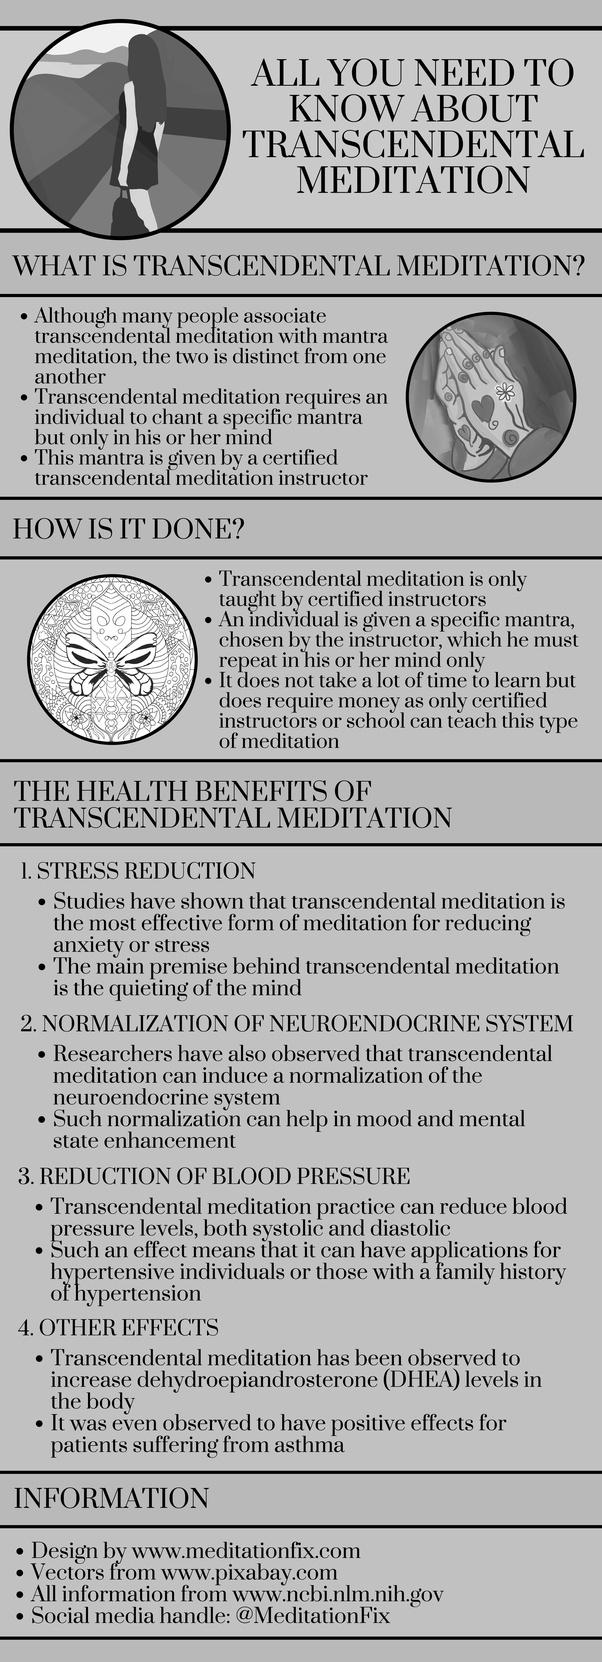 What Is Transcendental Meditation Quora